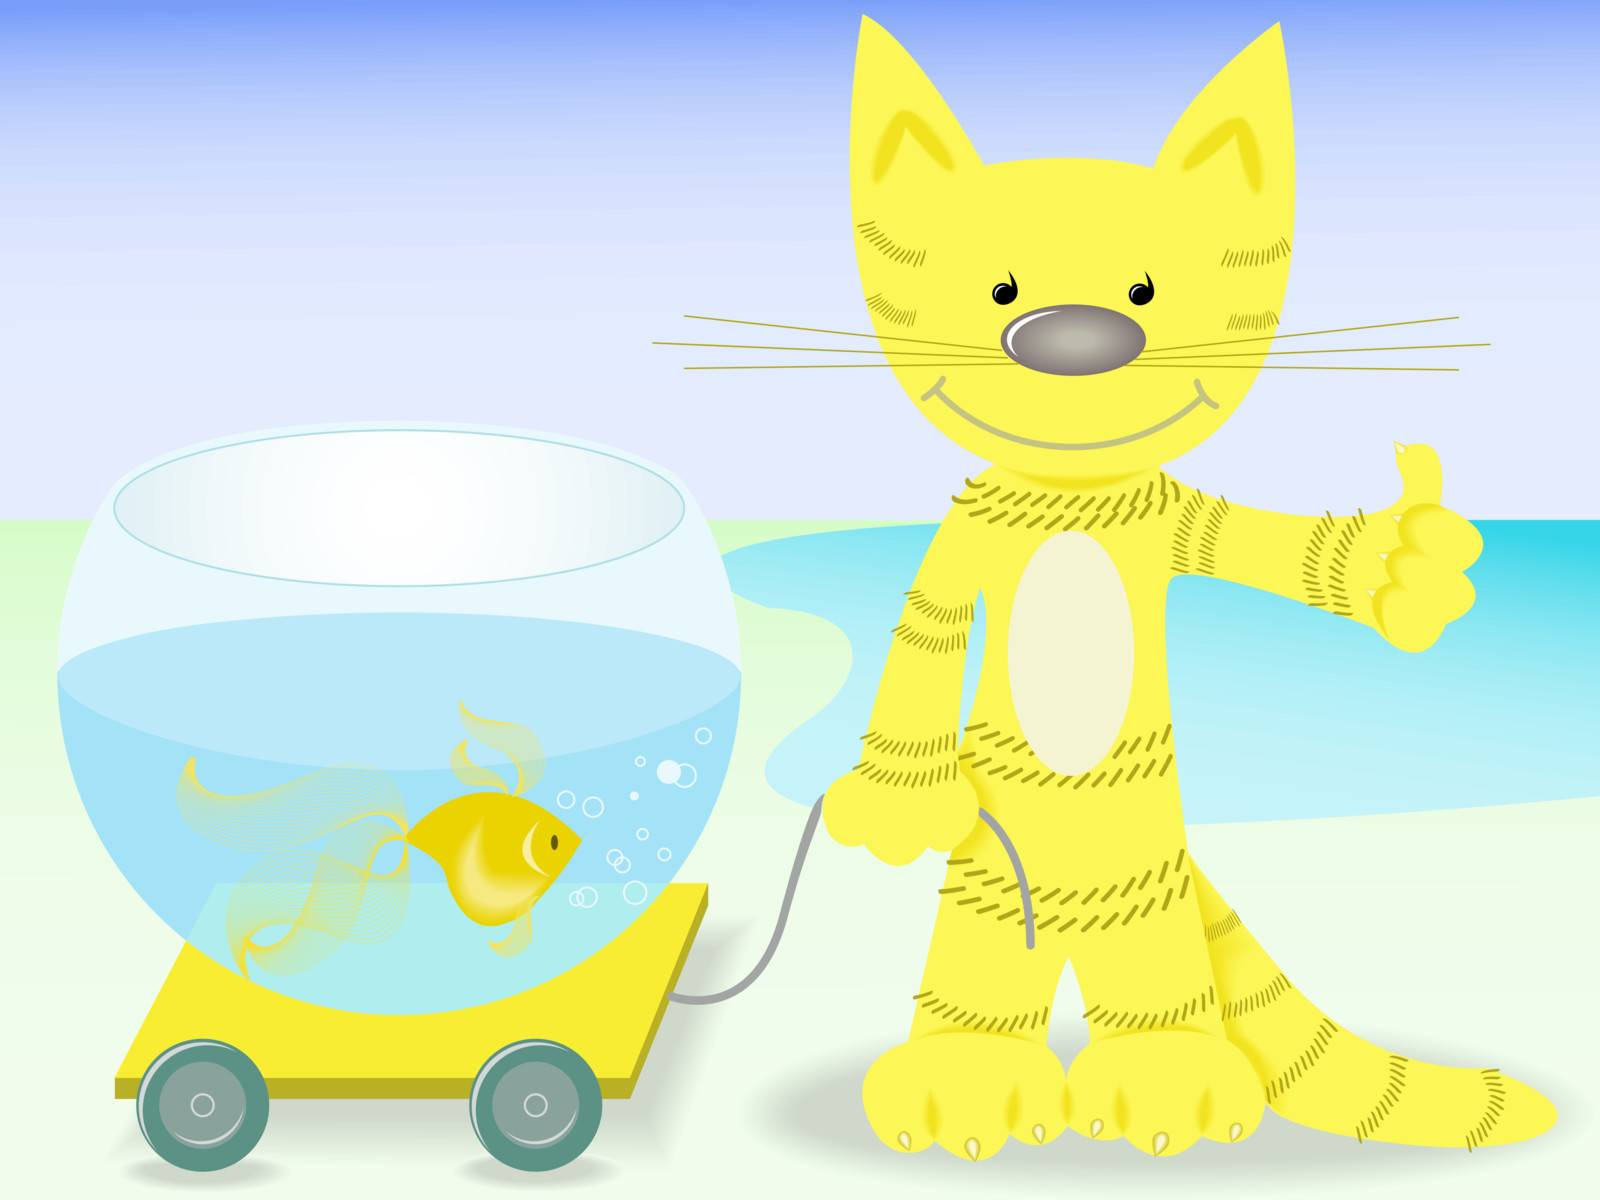 red cat lucky to cart aquarium with goldfish